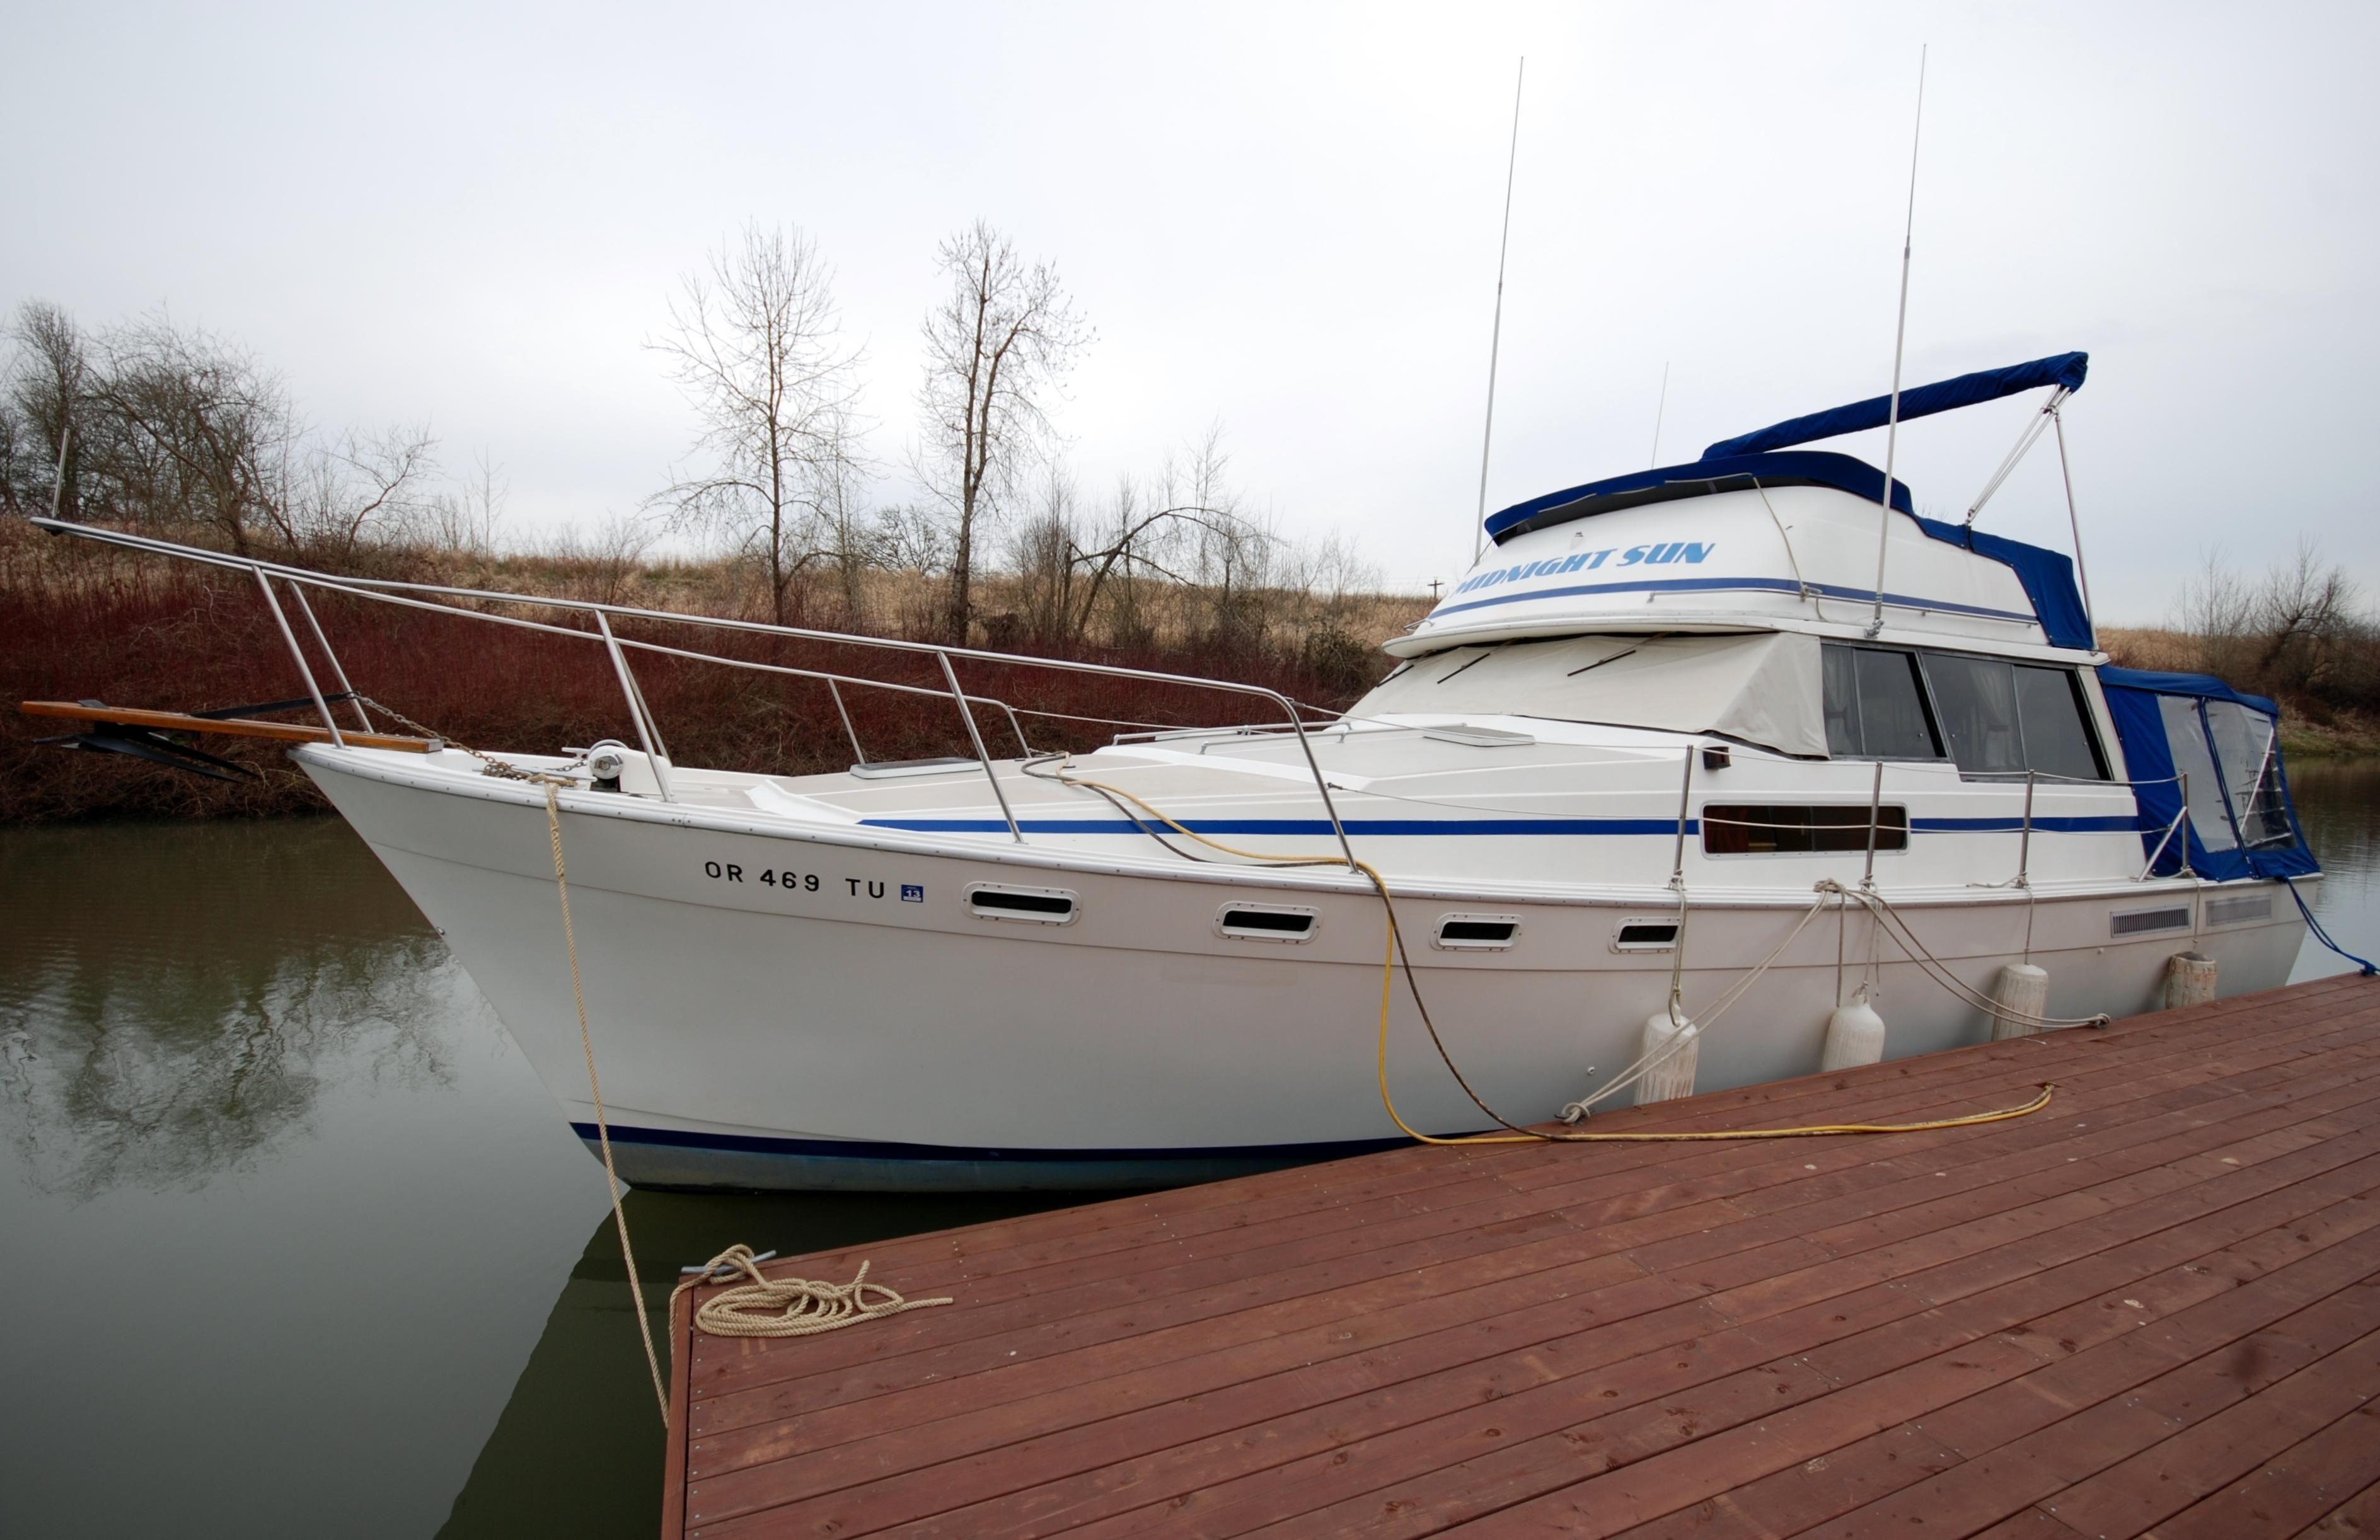 1984 celebrity boat for sale